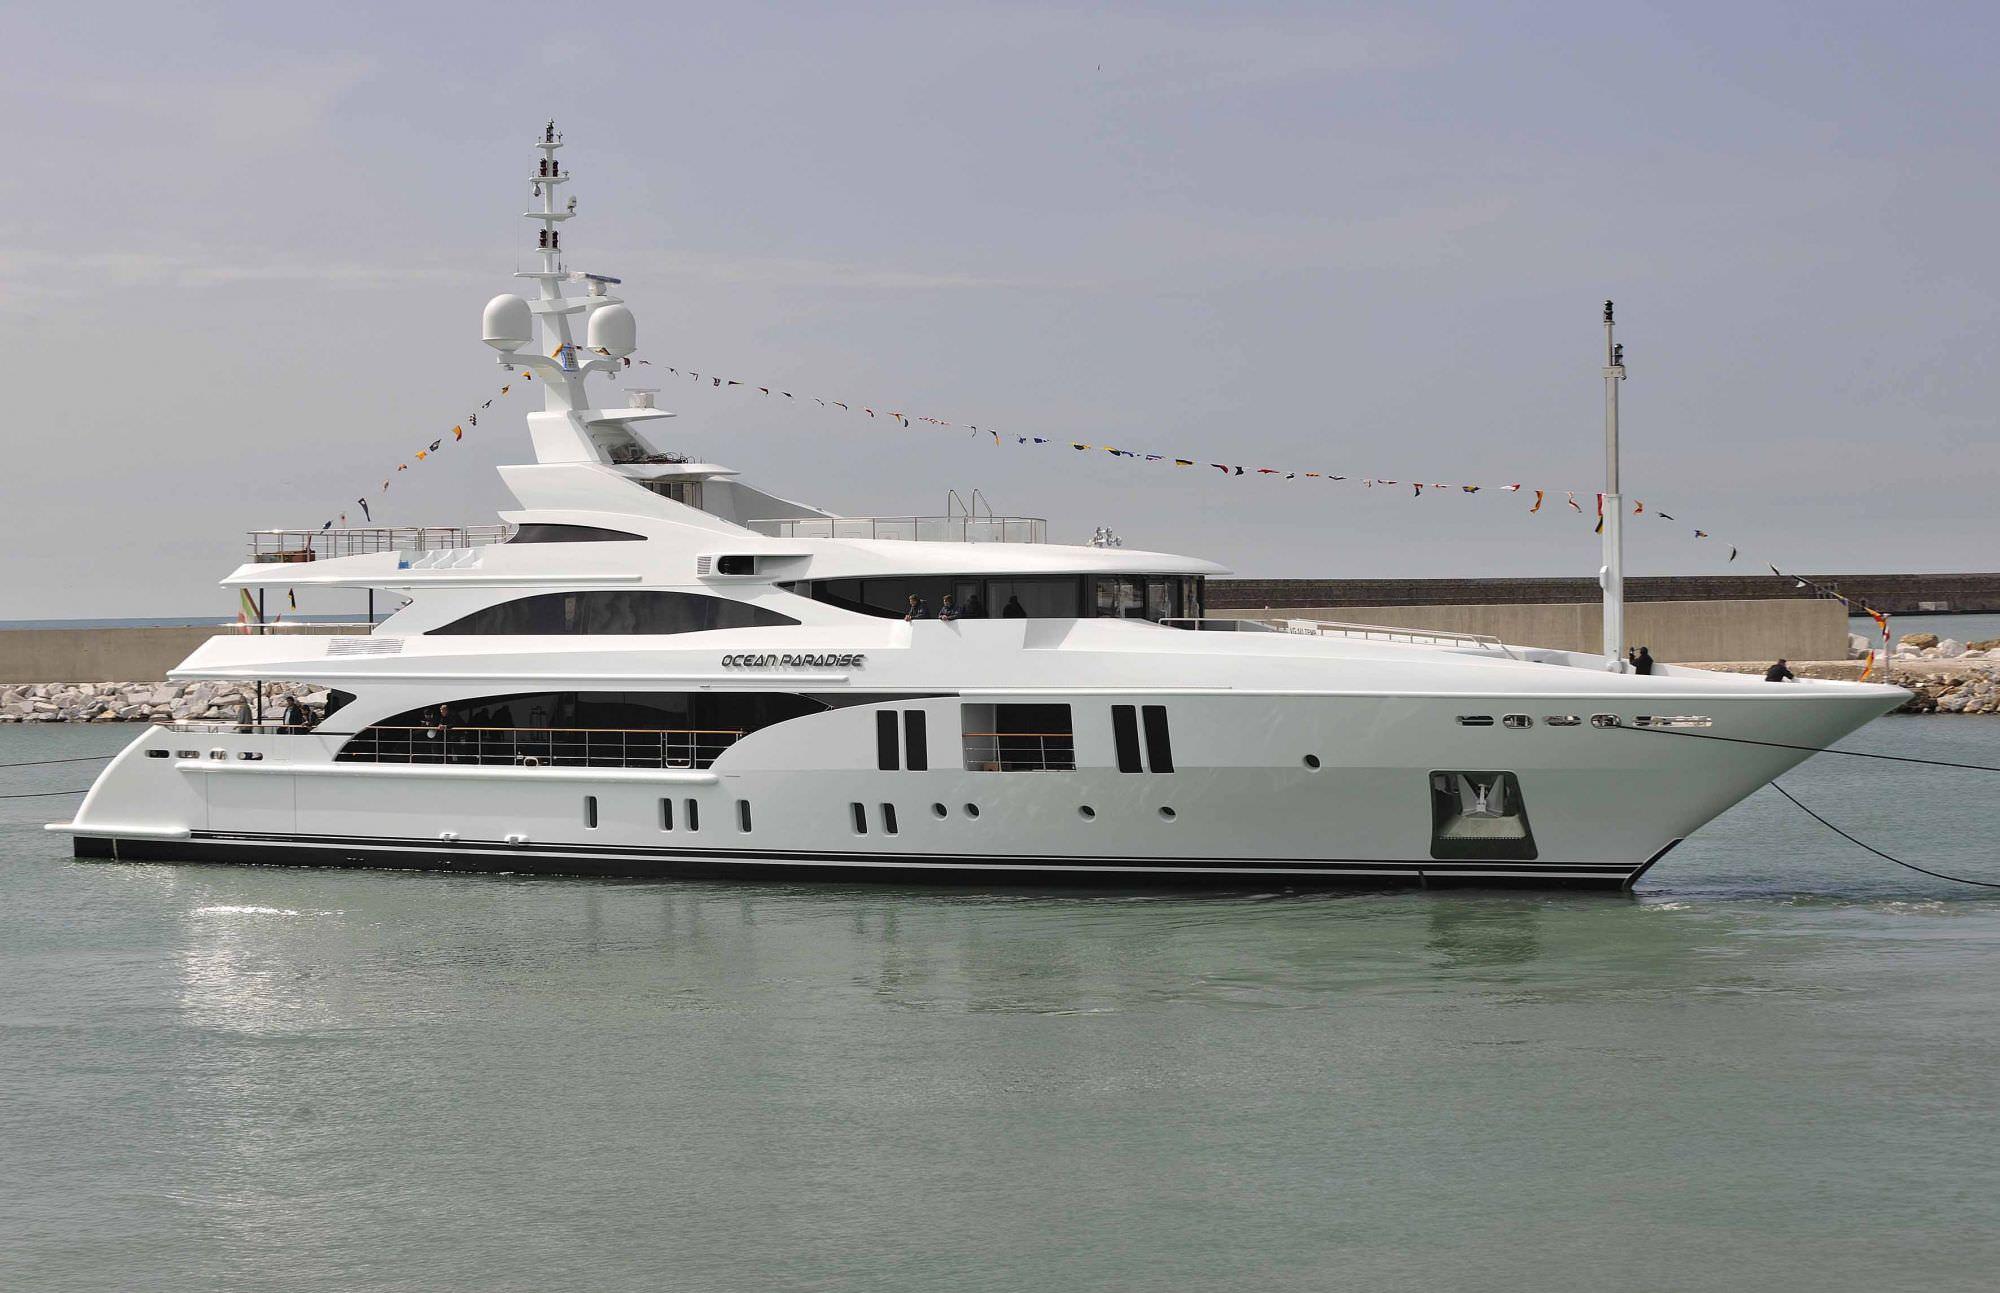 Benetti prende parte al Qatar International Boat Show